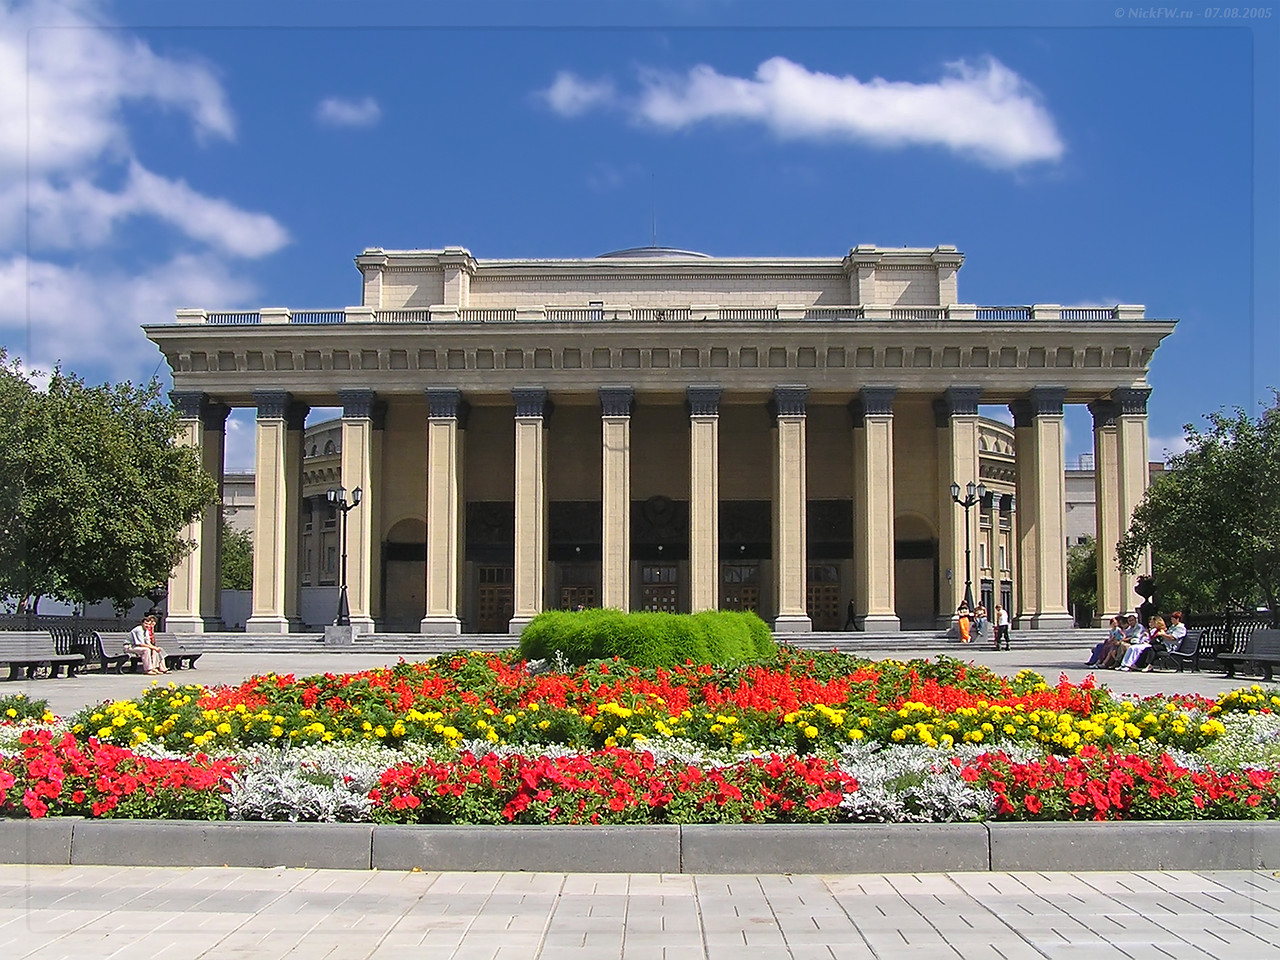 Новосибирский театр оперы и балета (© NickFW - 07.08.2005)